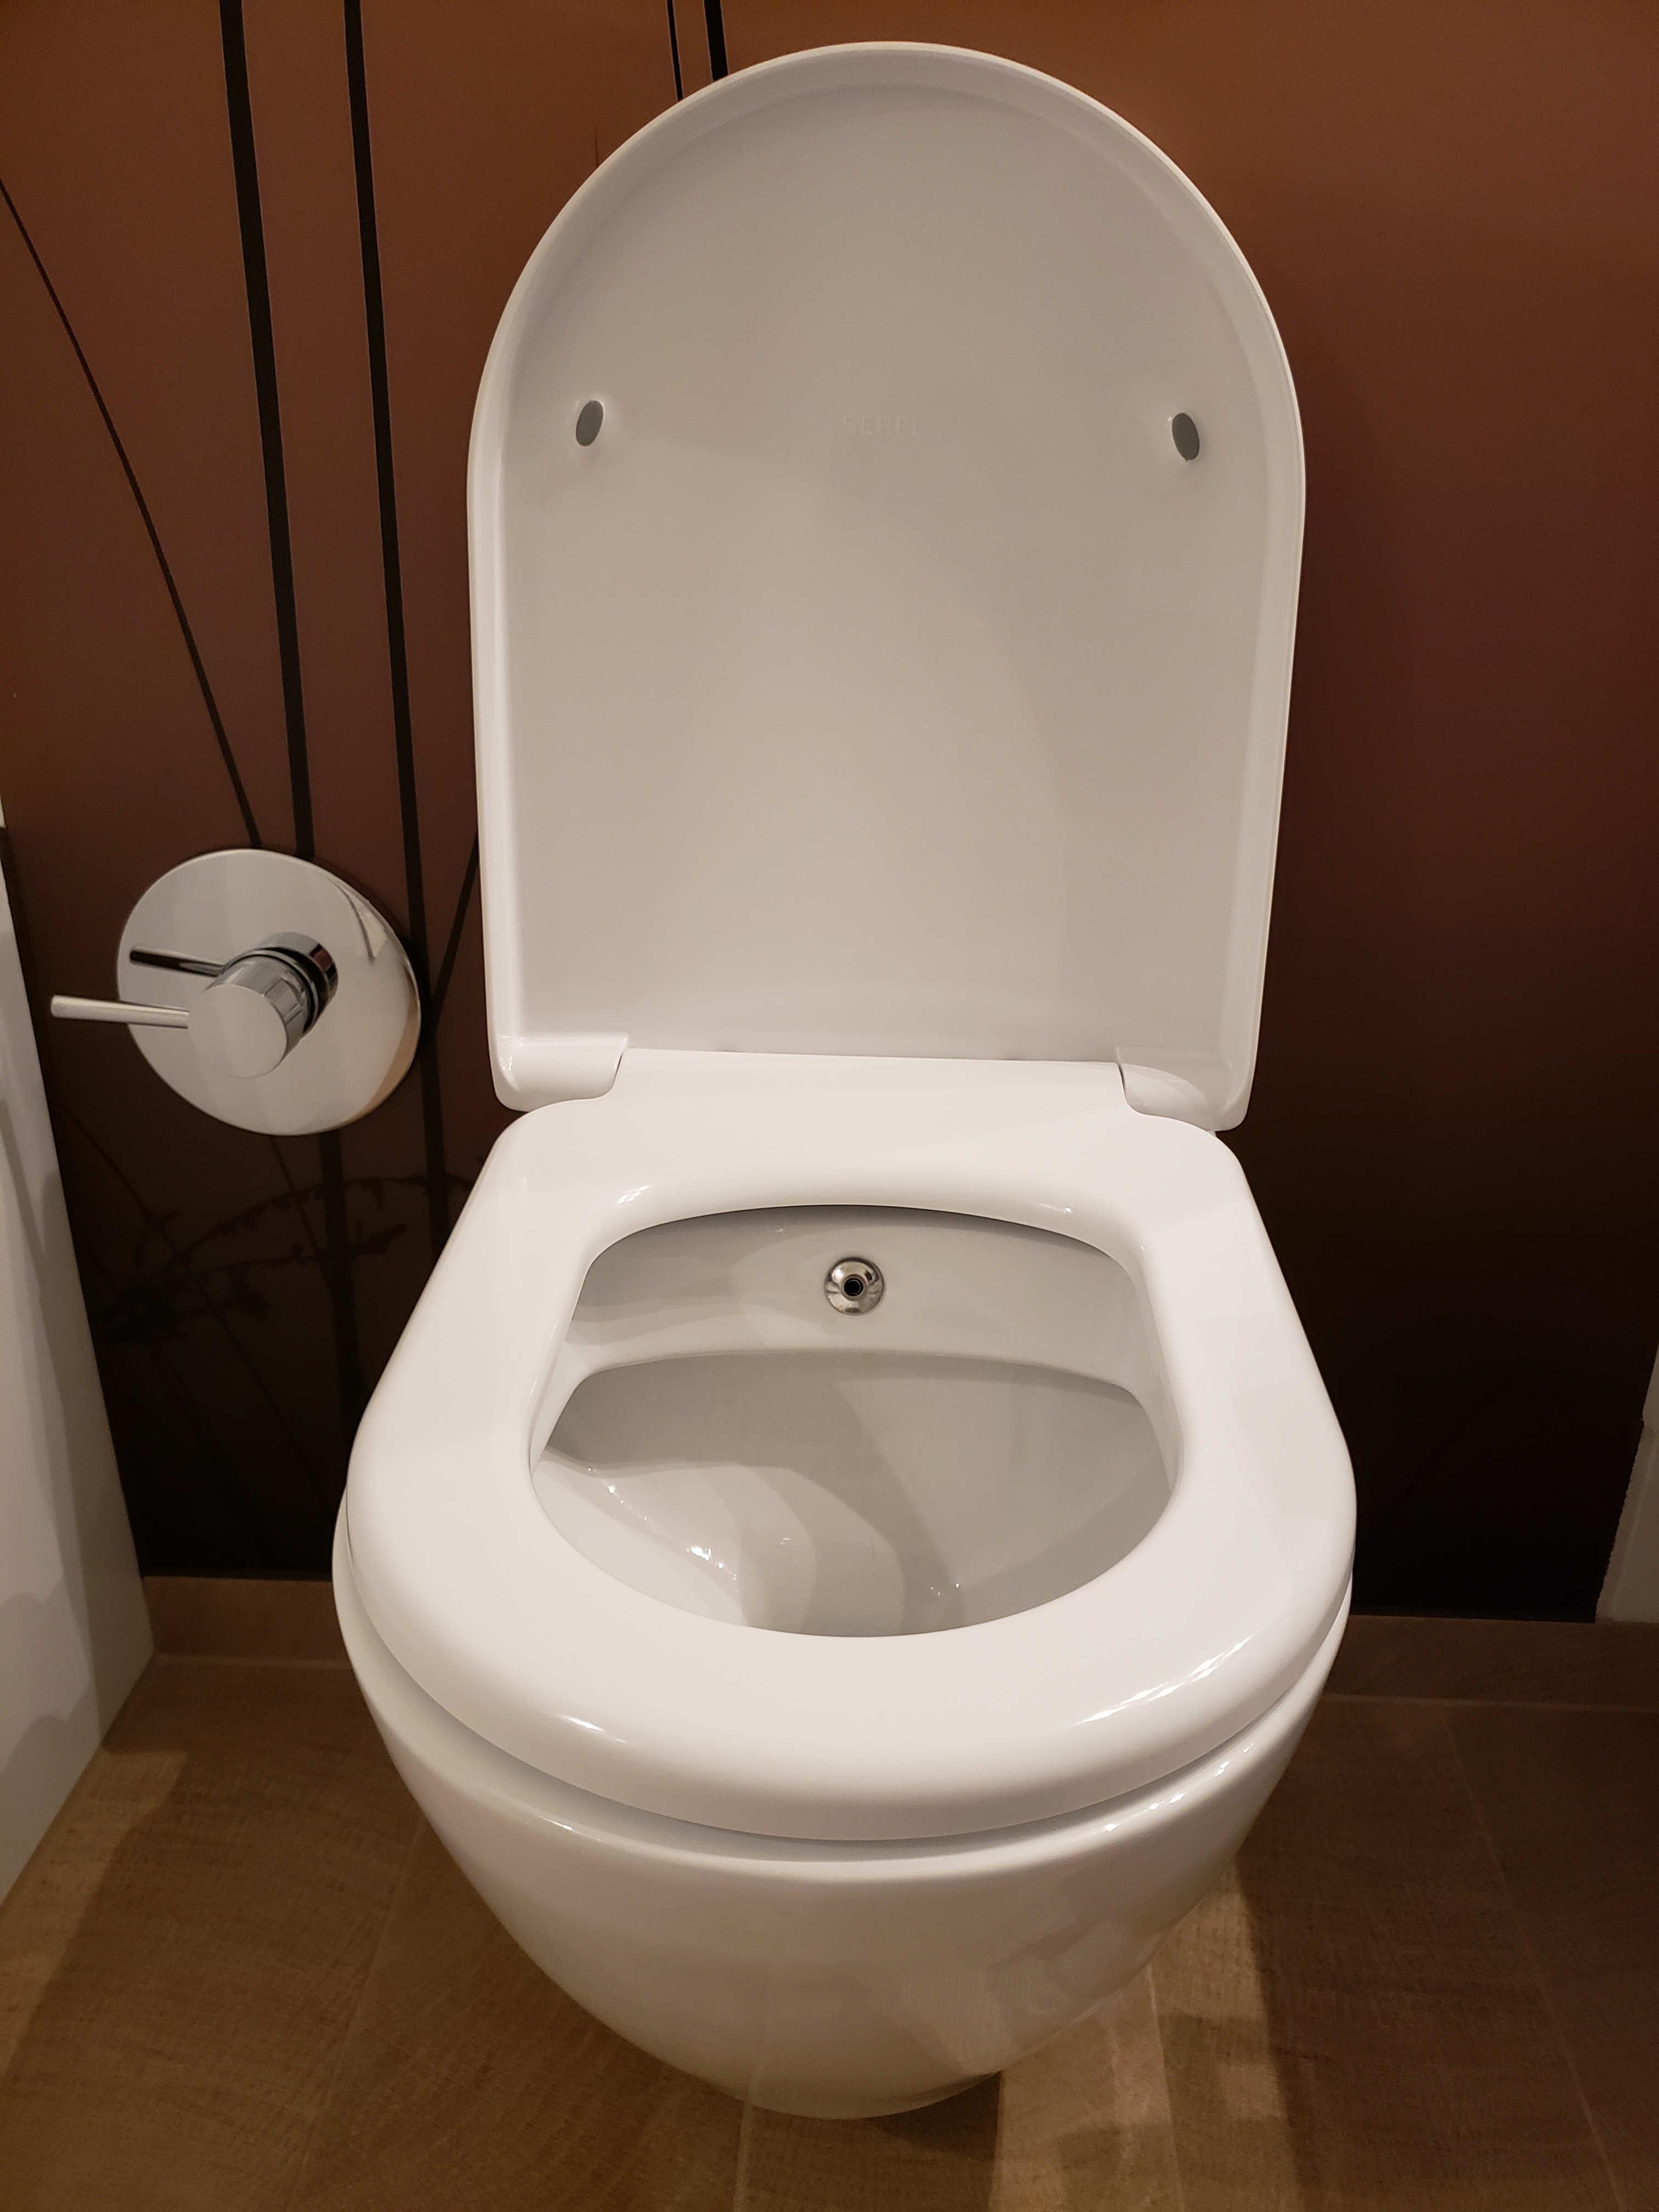 bidet toilet with temperature mixer